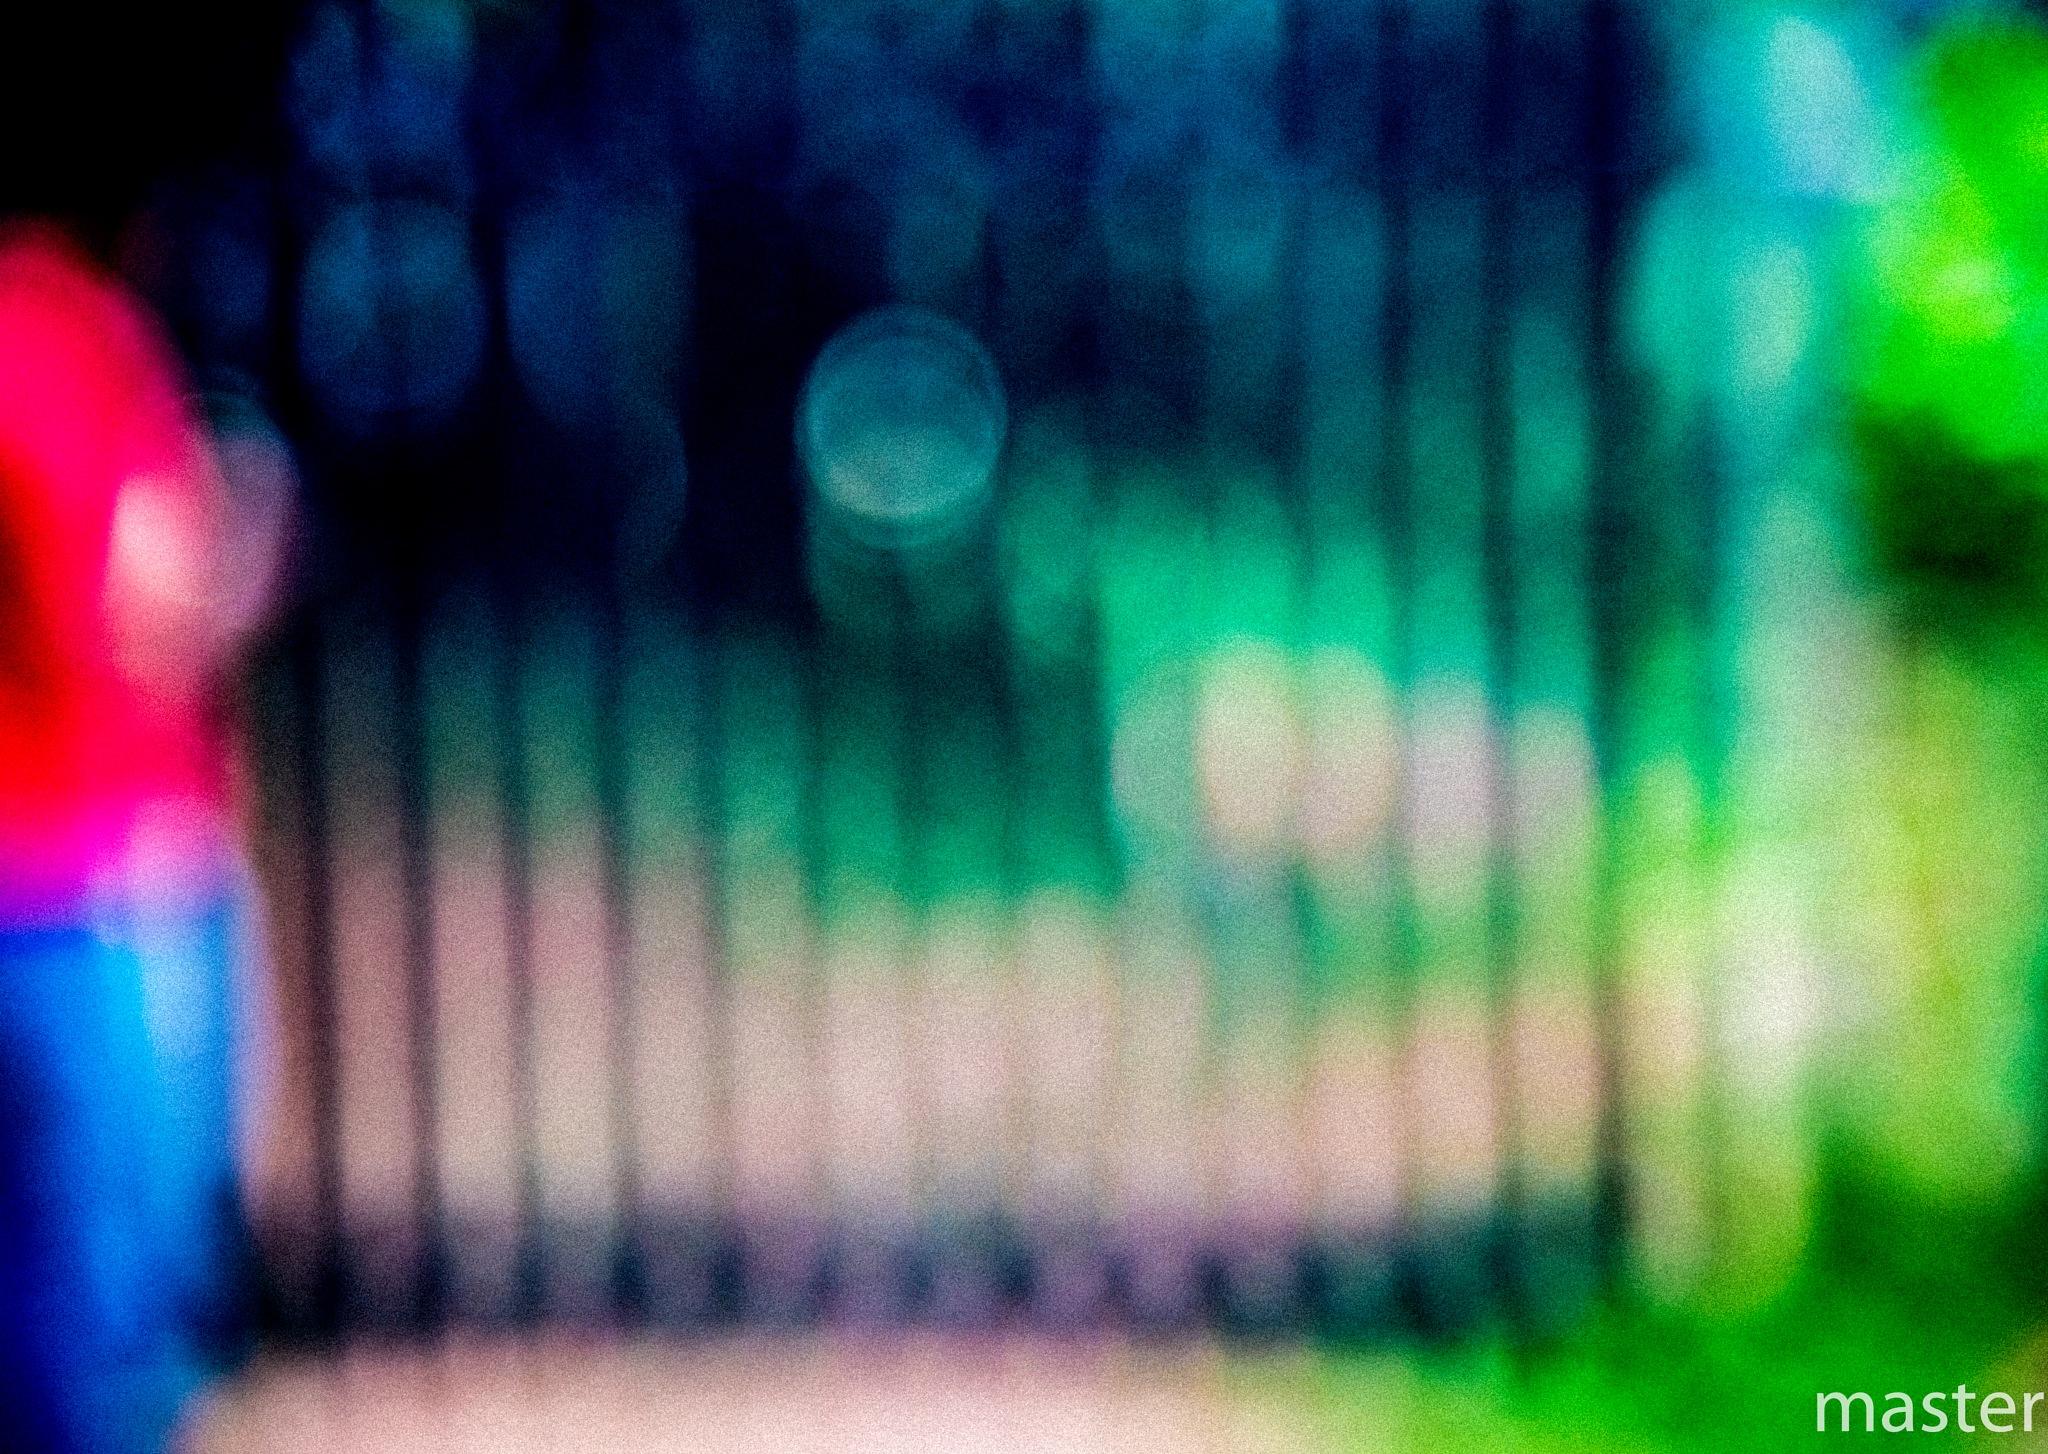 Distorted memories......! by Ajinkya khare